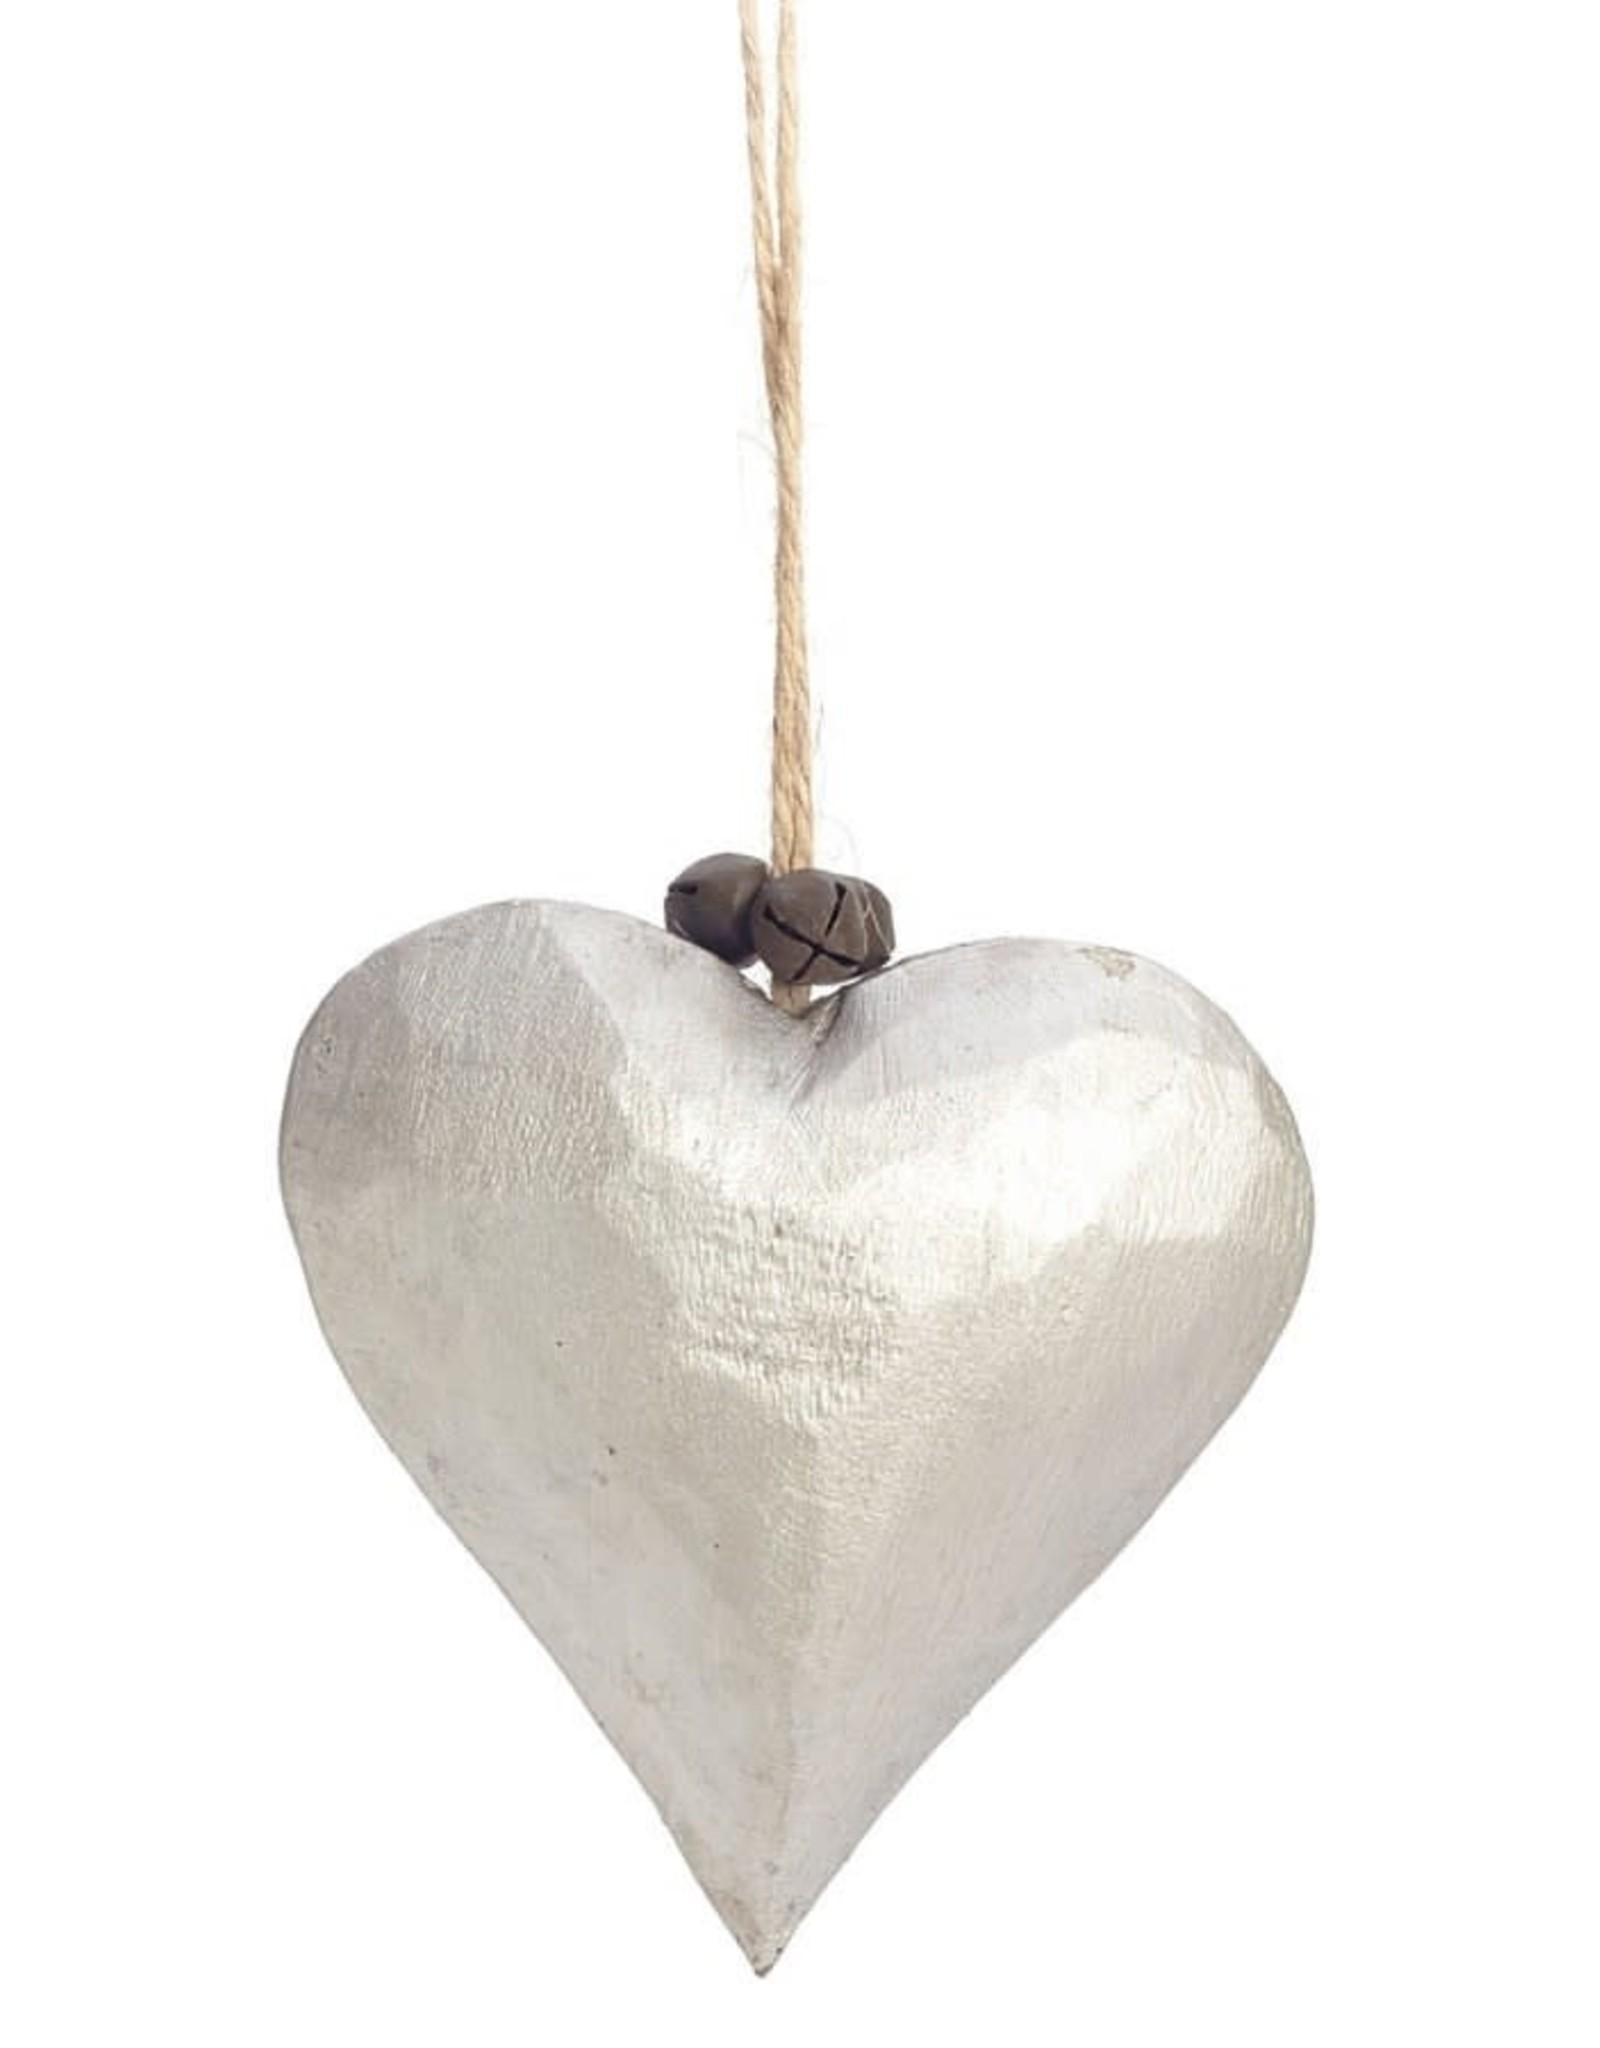 Silver Wooden Heart Ornament